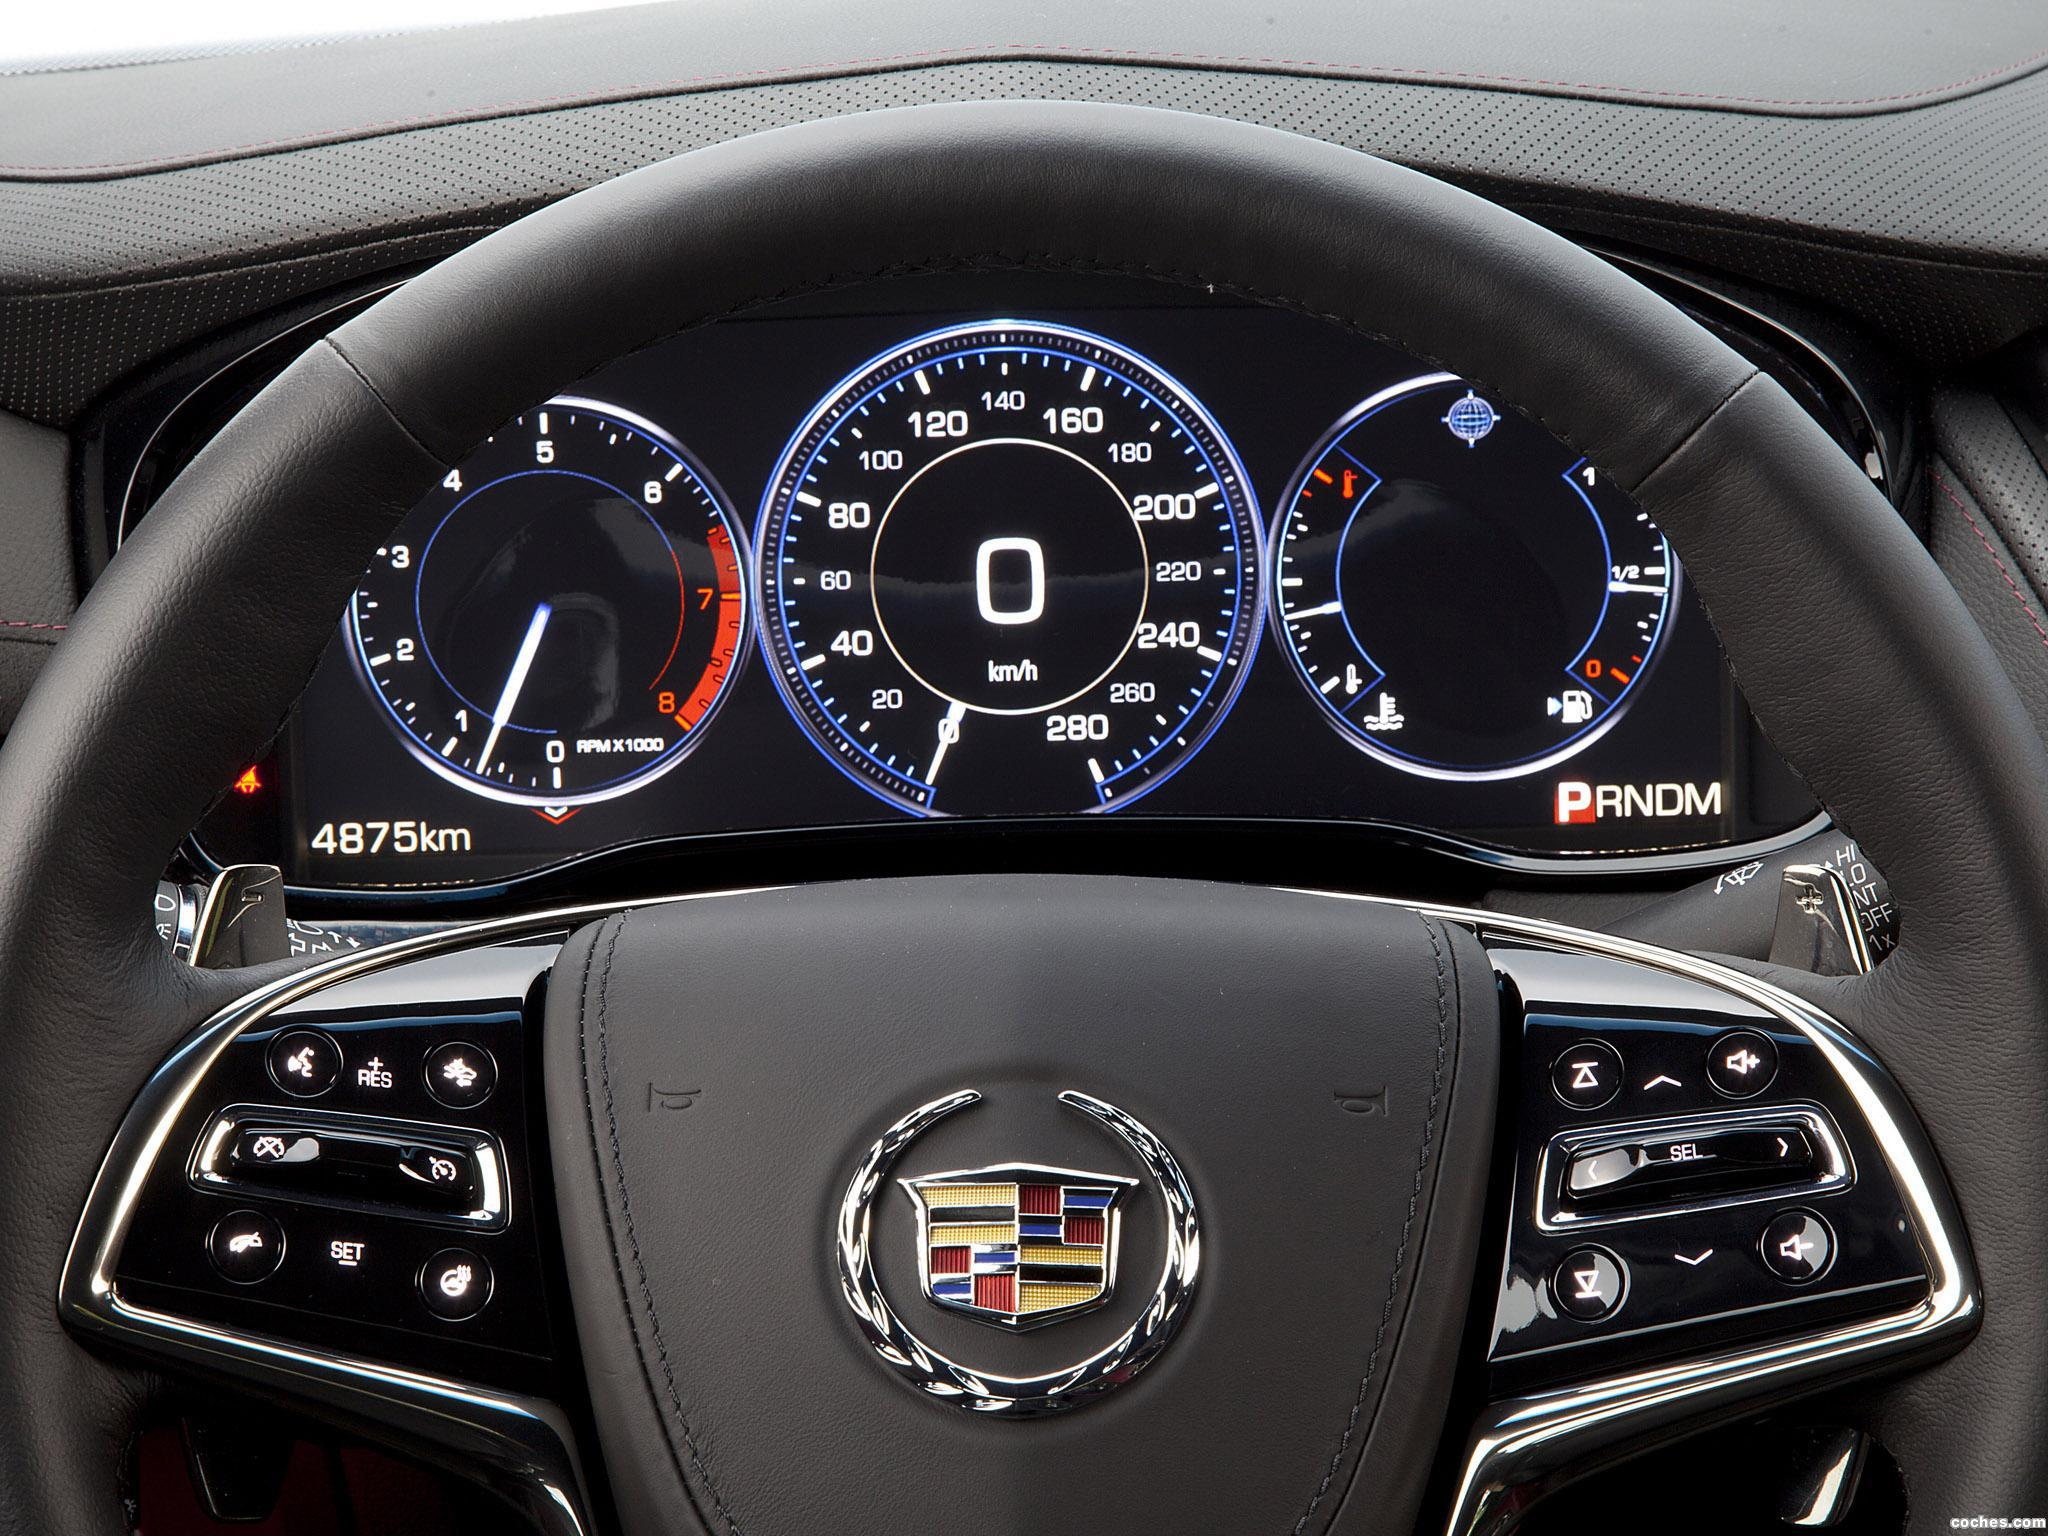 Foto 17 de Cadillac CTS Europe 2014